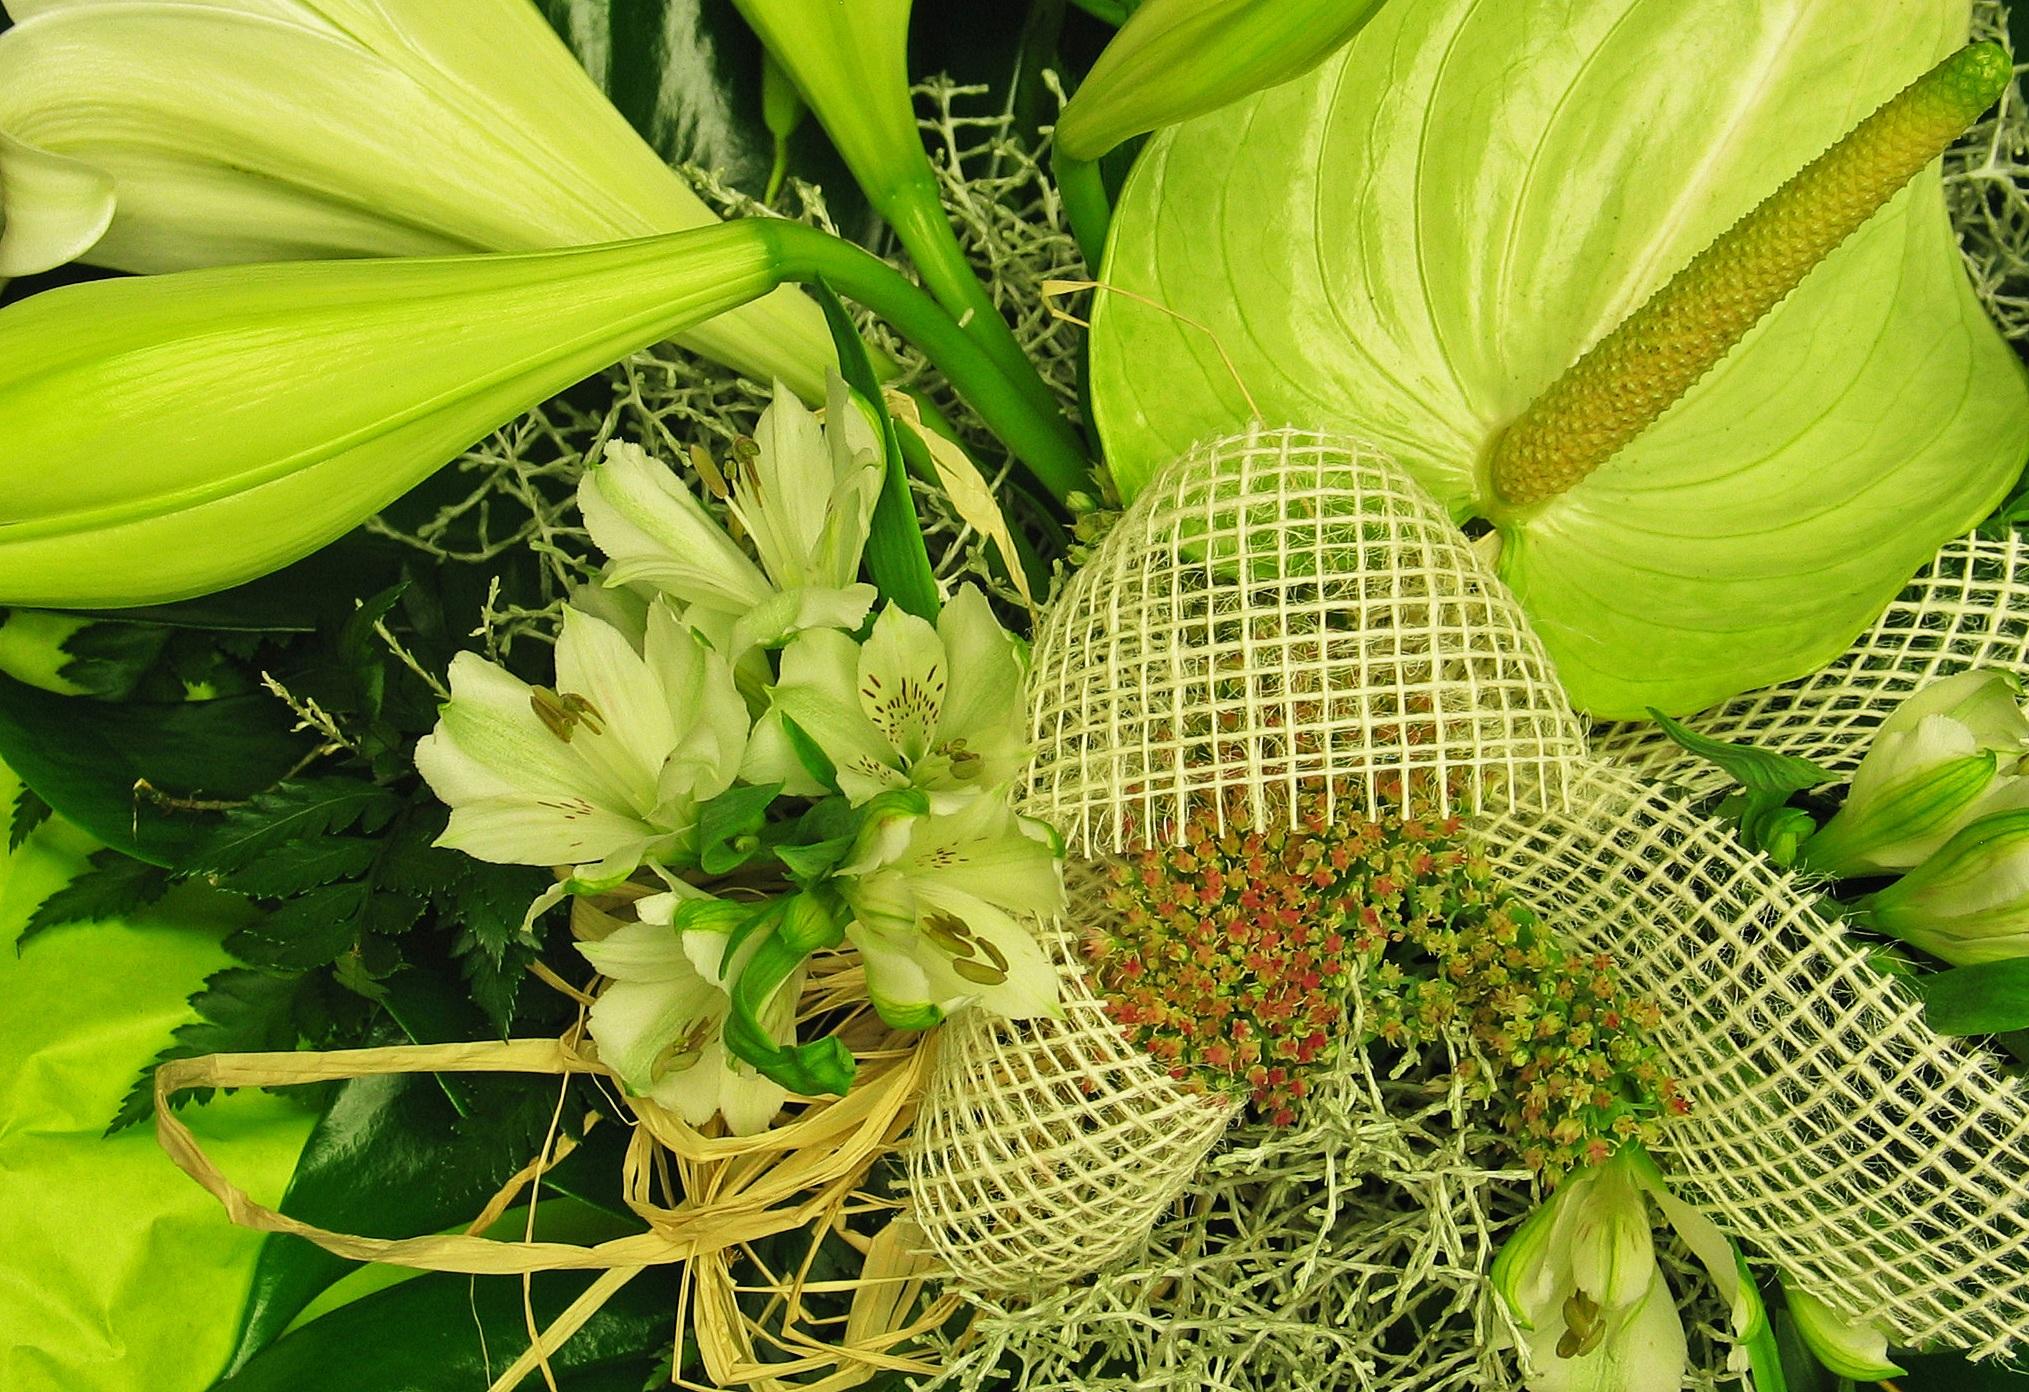 Free Images Leaf Food Produce Botany Yellow Flora